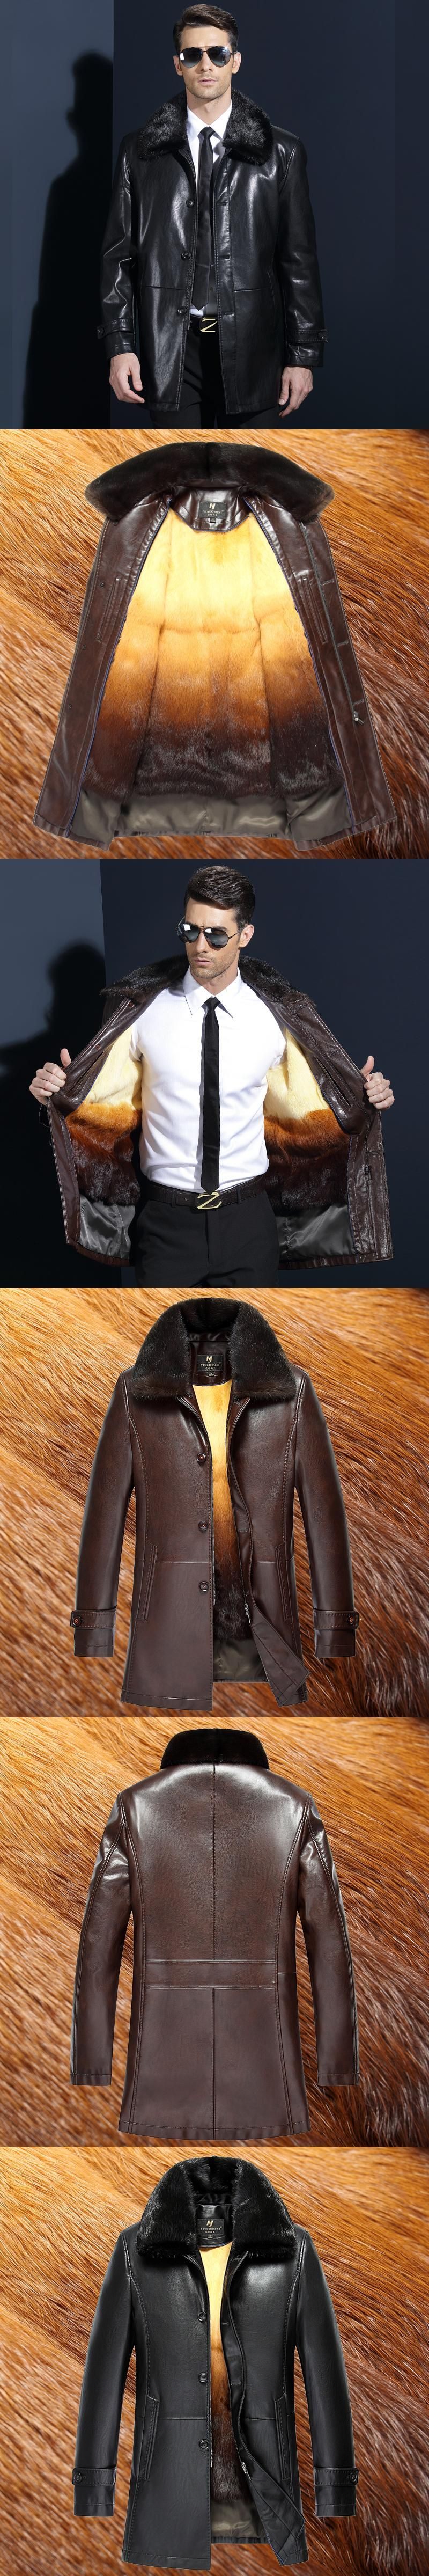 2018 Autumn Winter mink fur collar Faux Leather Fur Coat Men Warm Thick Long Sleeve High Quality Leather Jacket Fur Coats